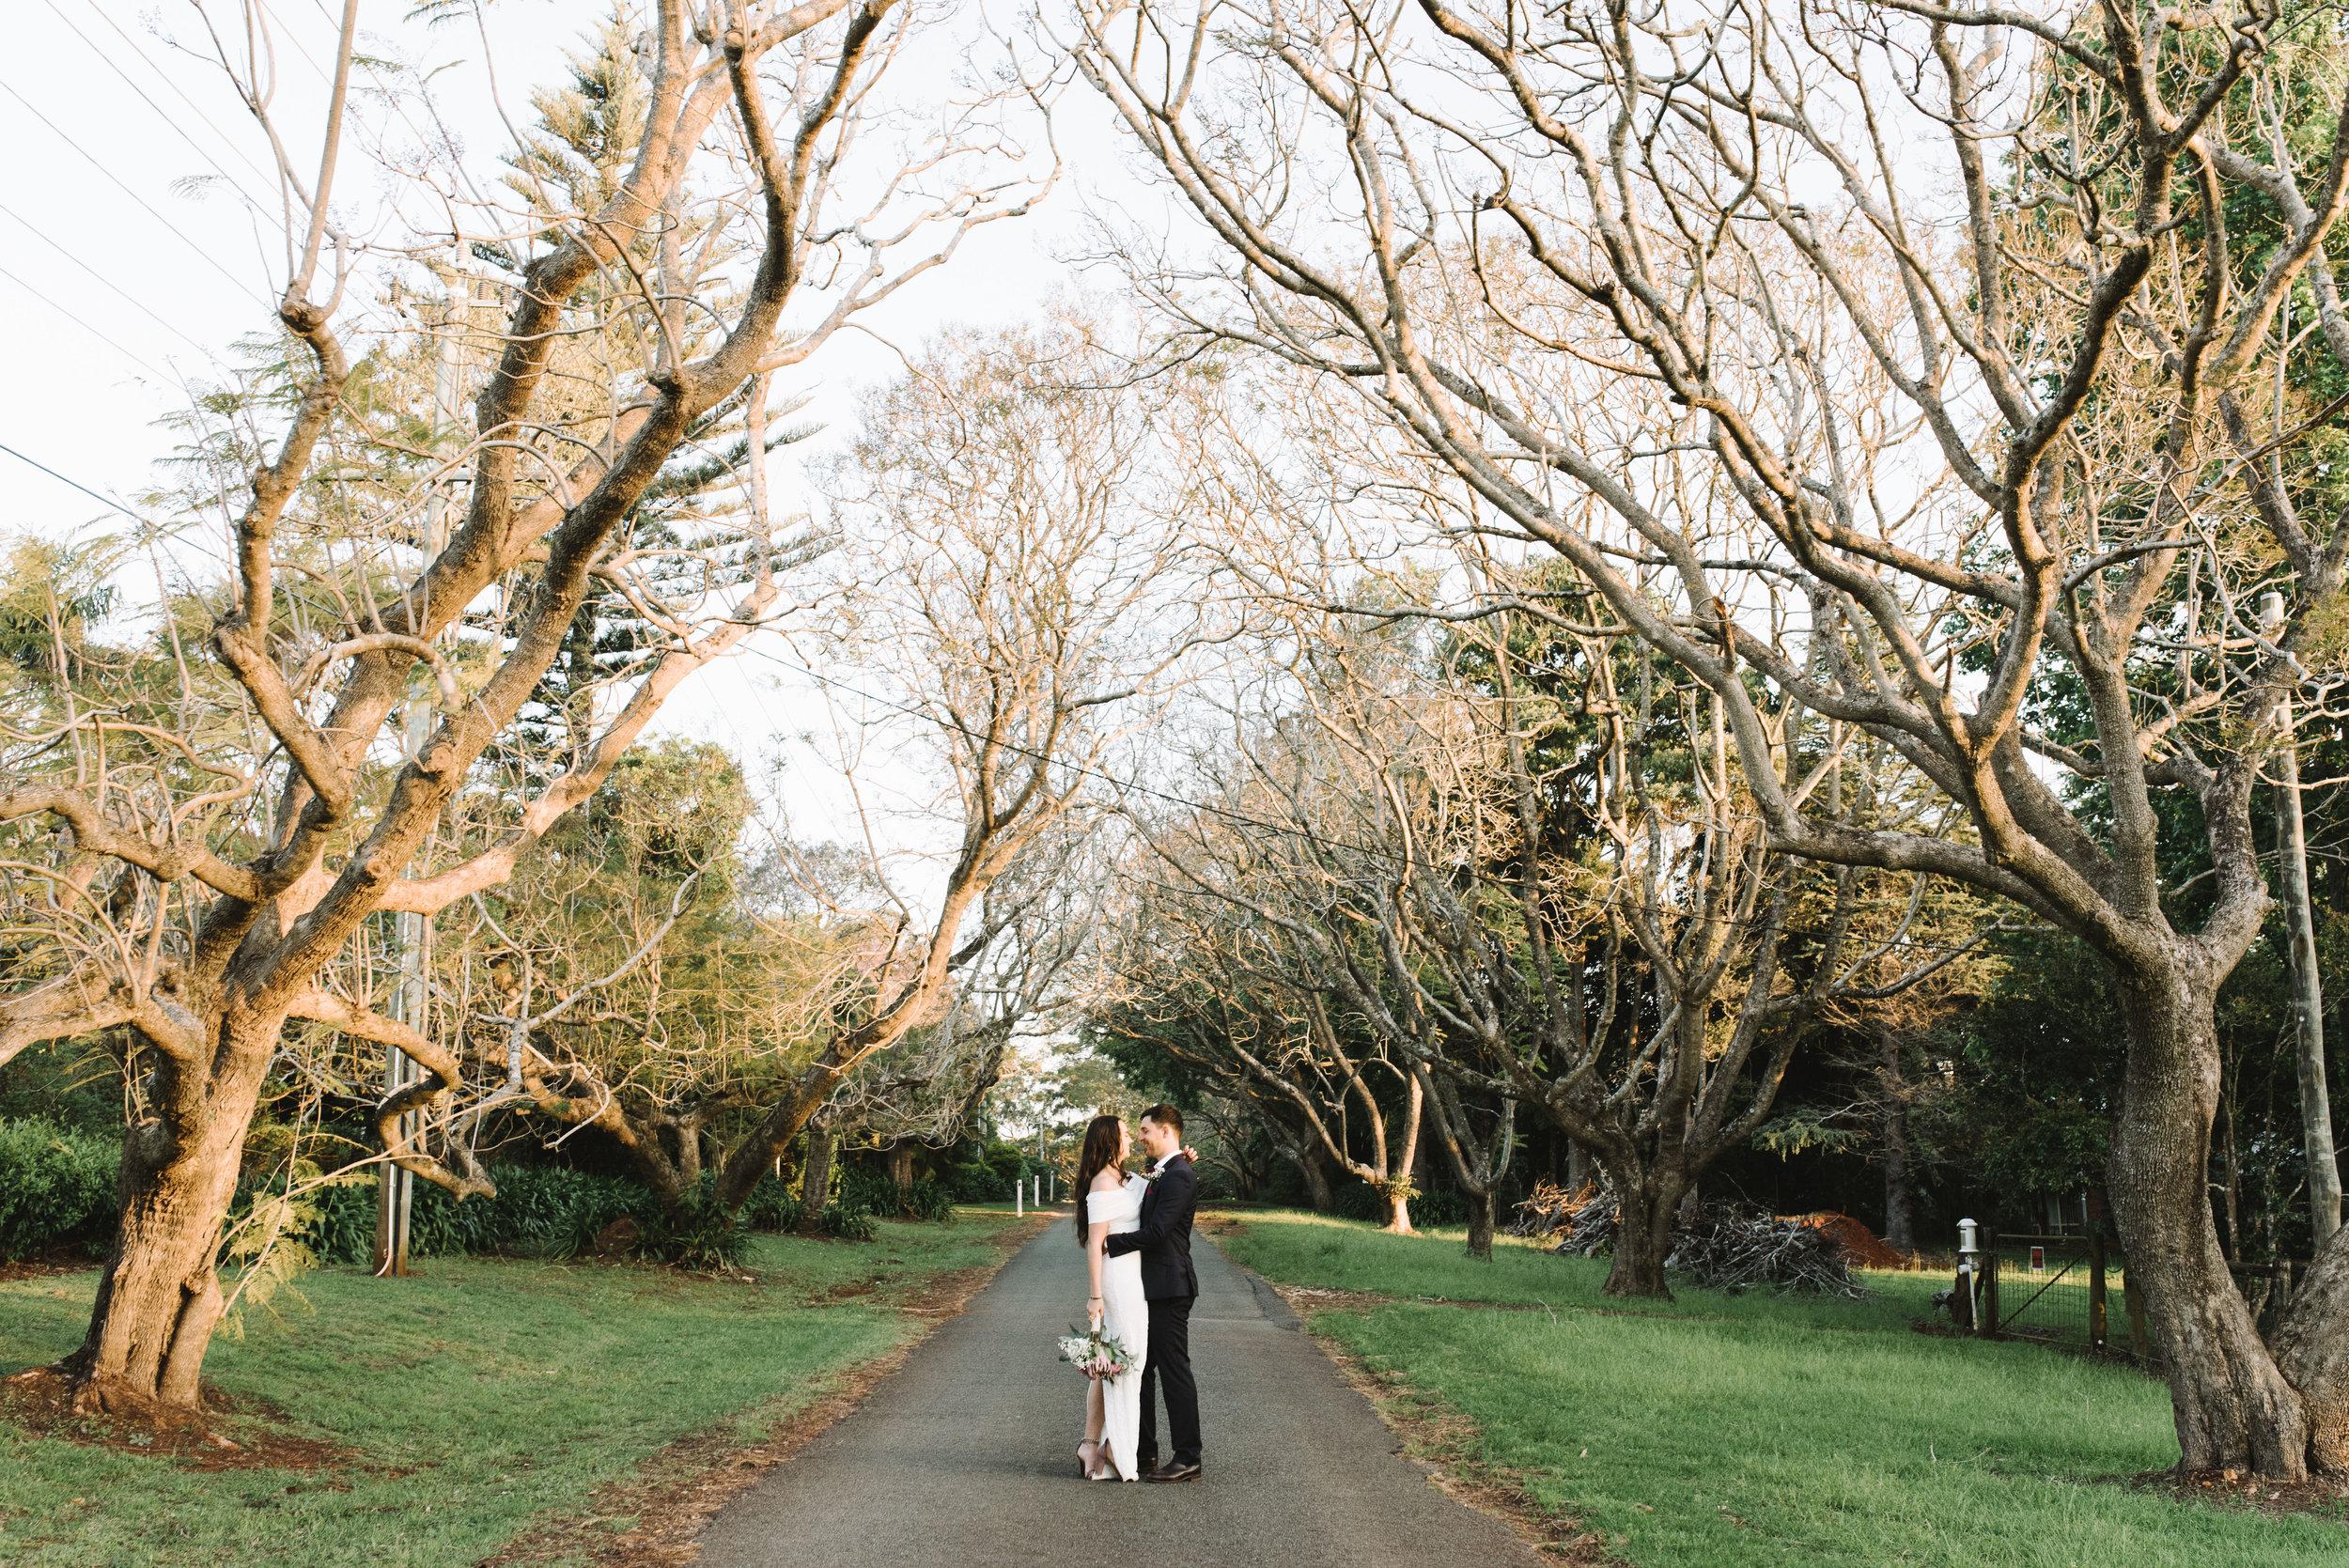 brisbane-gold-coast-sunshine-coast-wedding-photographer-mount-tamborine-wedding-1-60.jpg